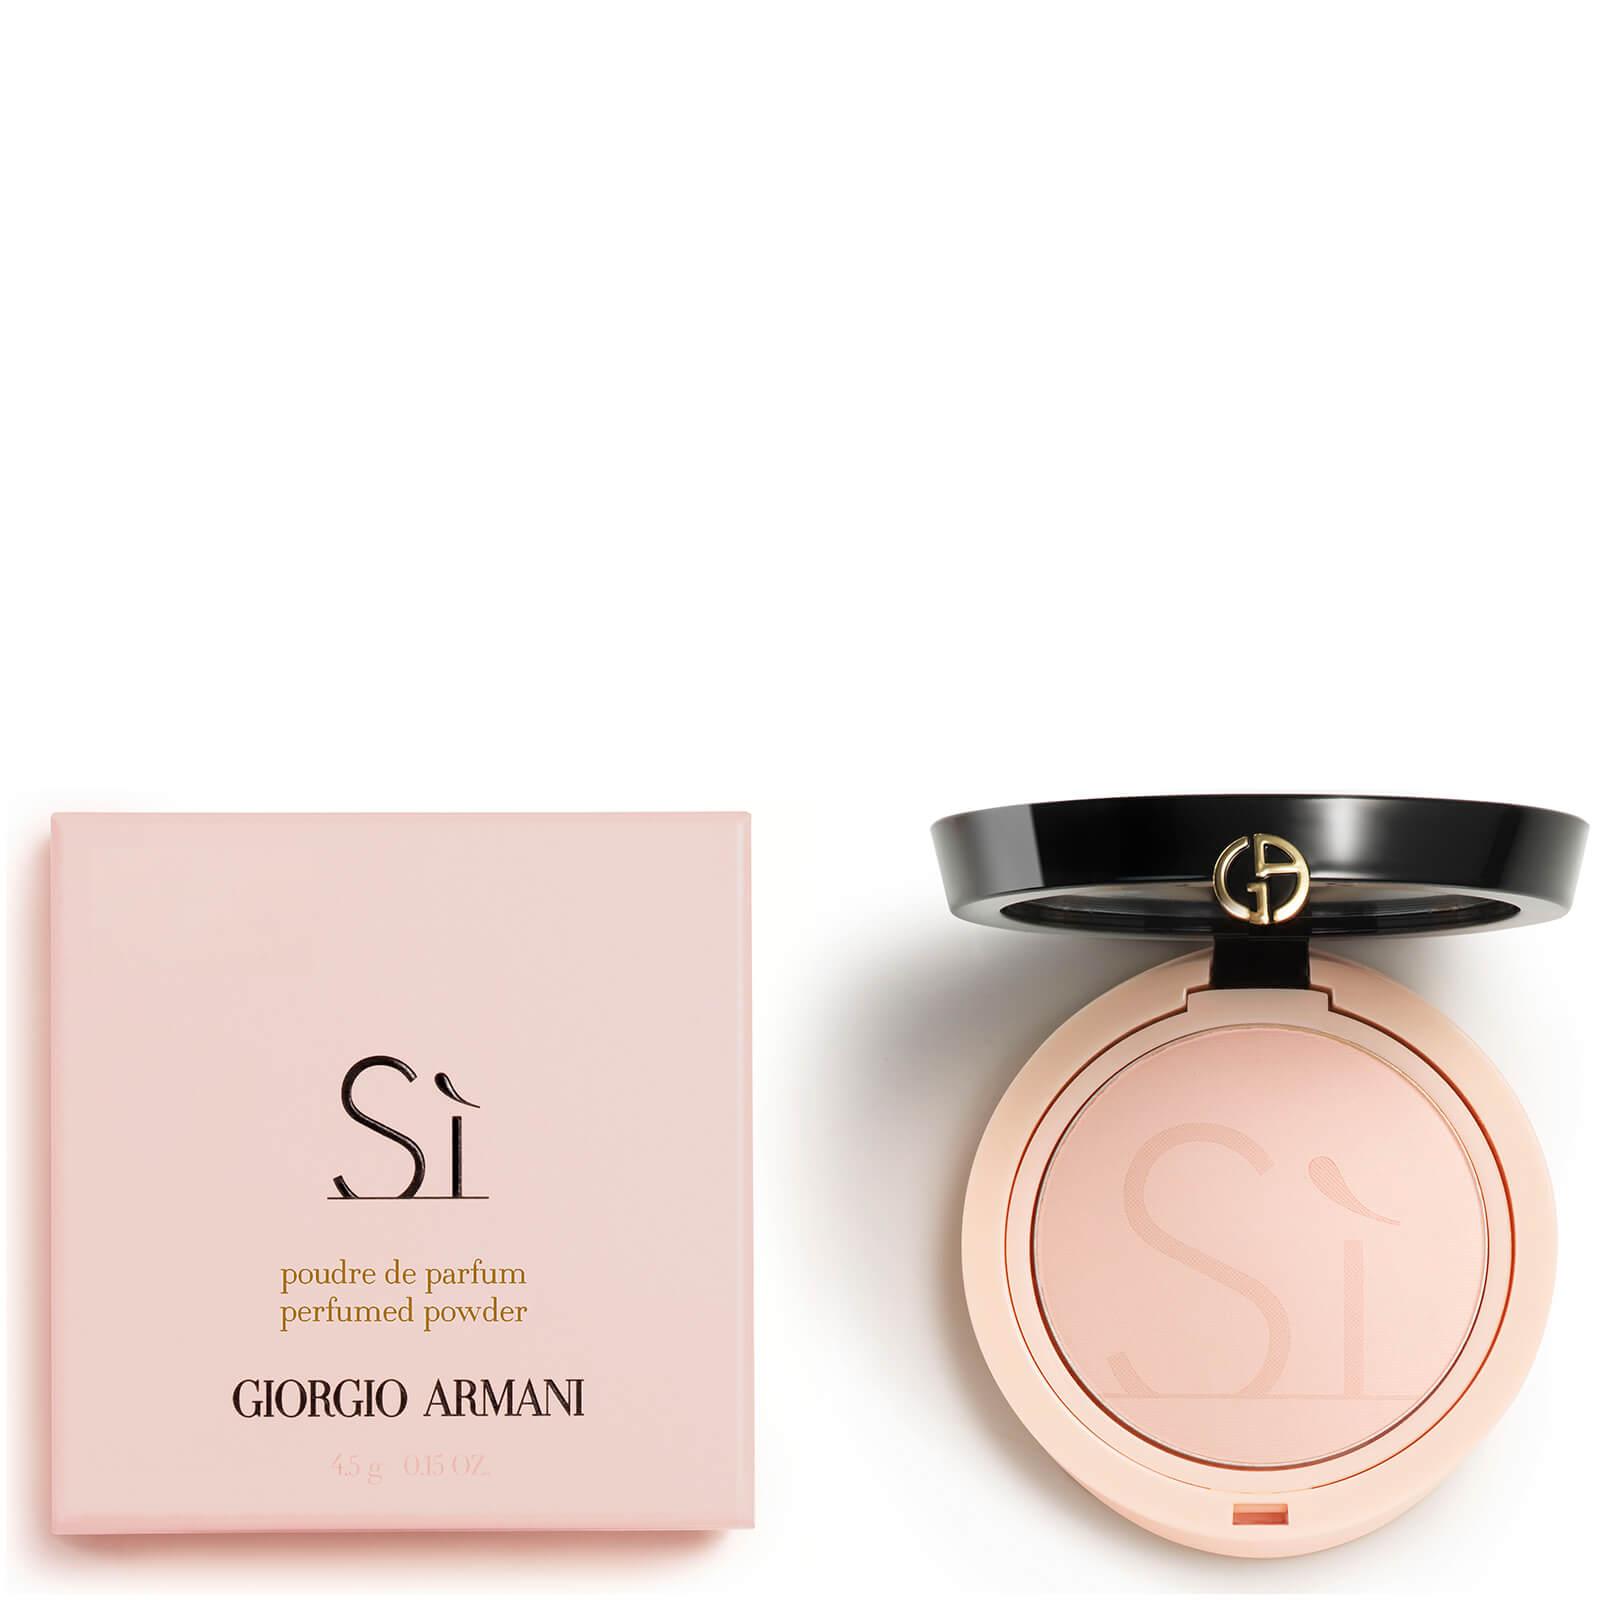 Giorgio Armani Si Perfumed Powder Free Shipping Lookfantastic